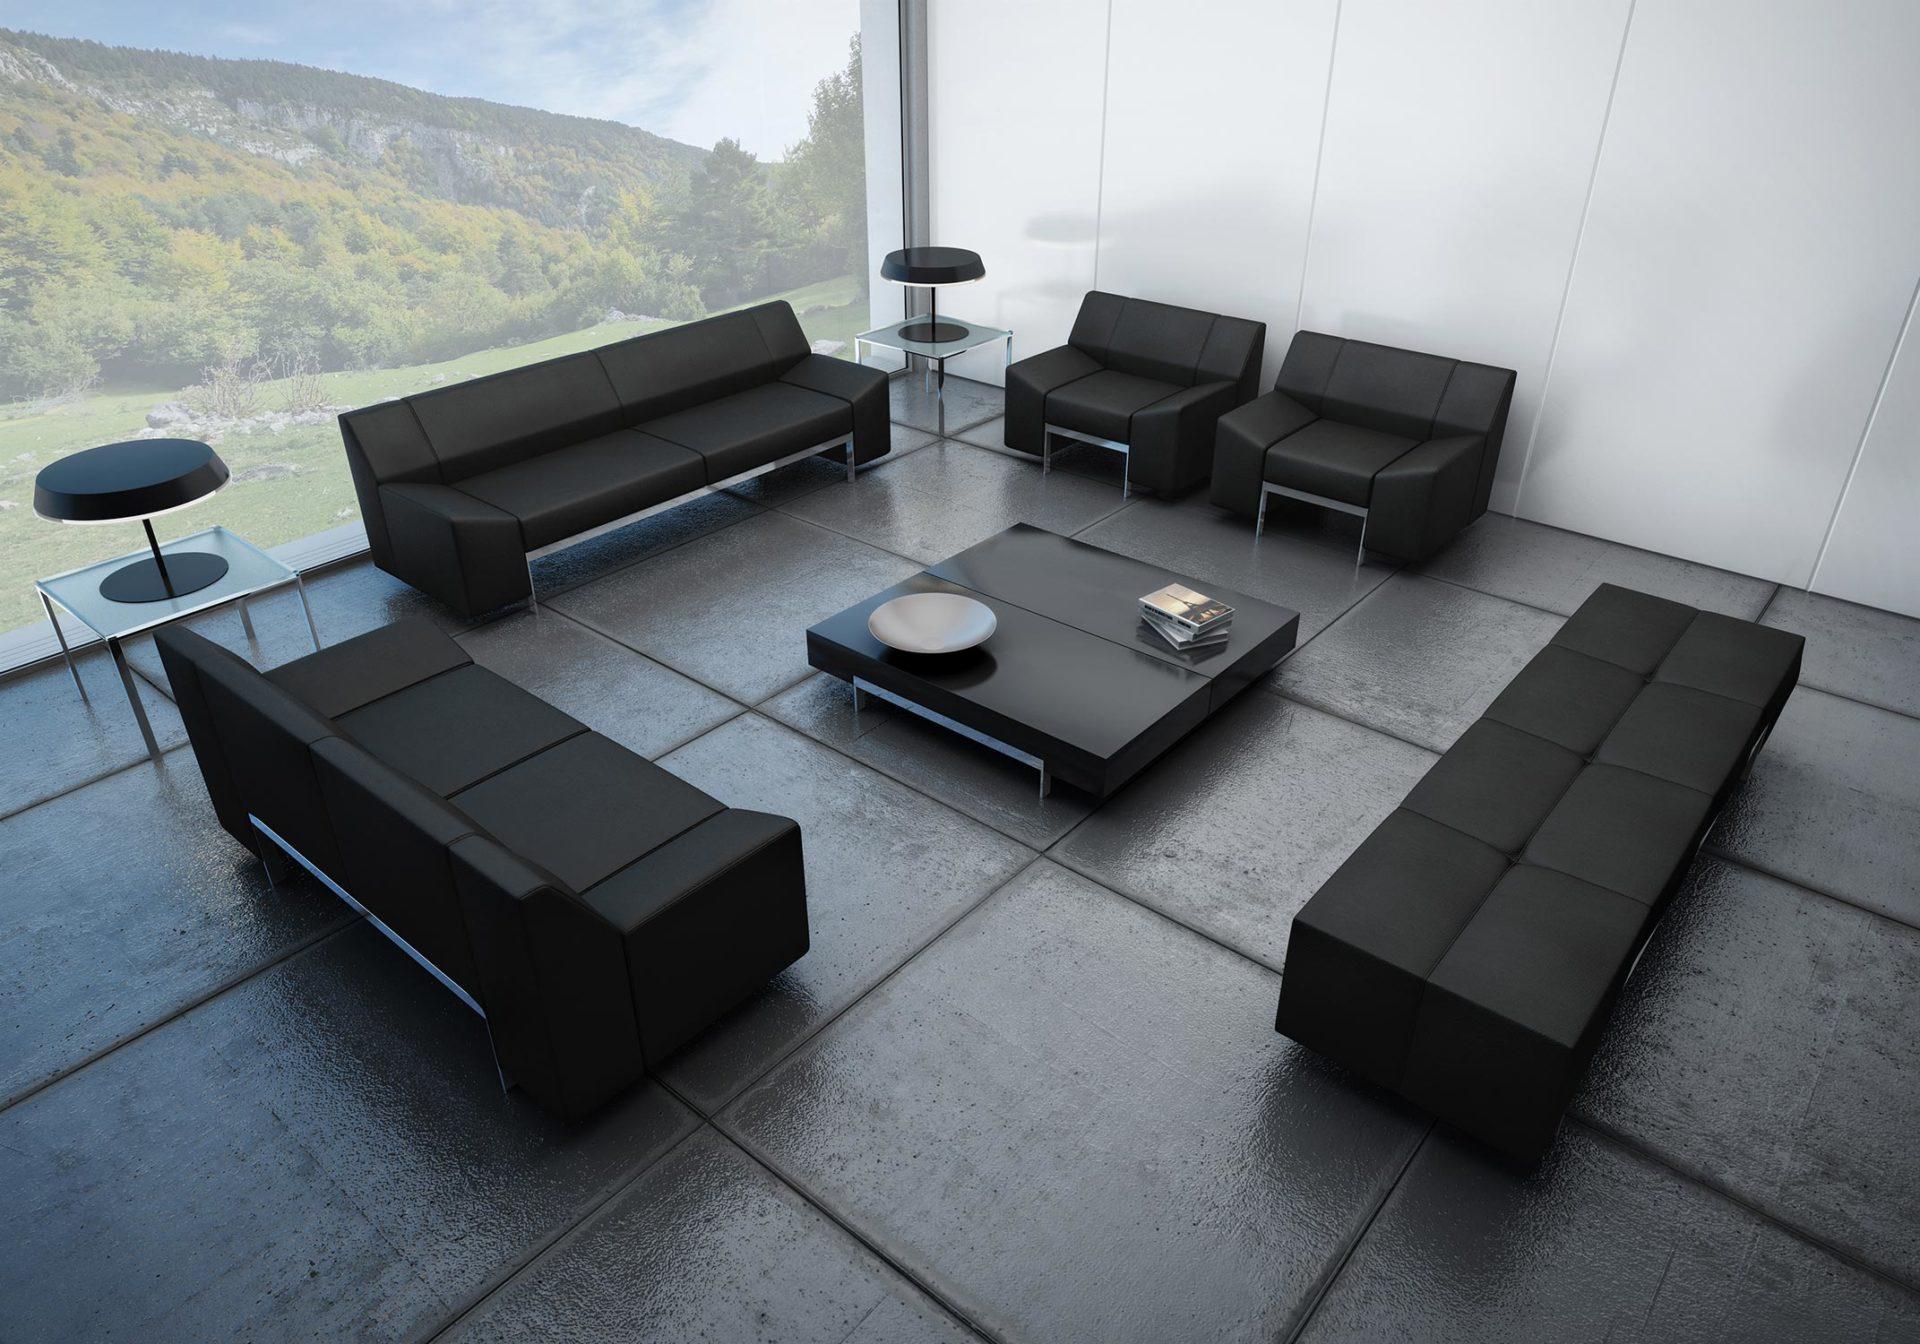 Avocado_The-corporate-sofa